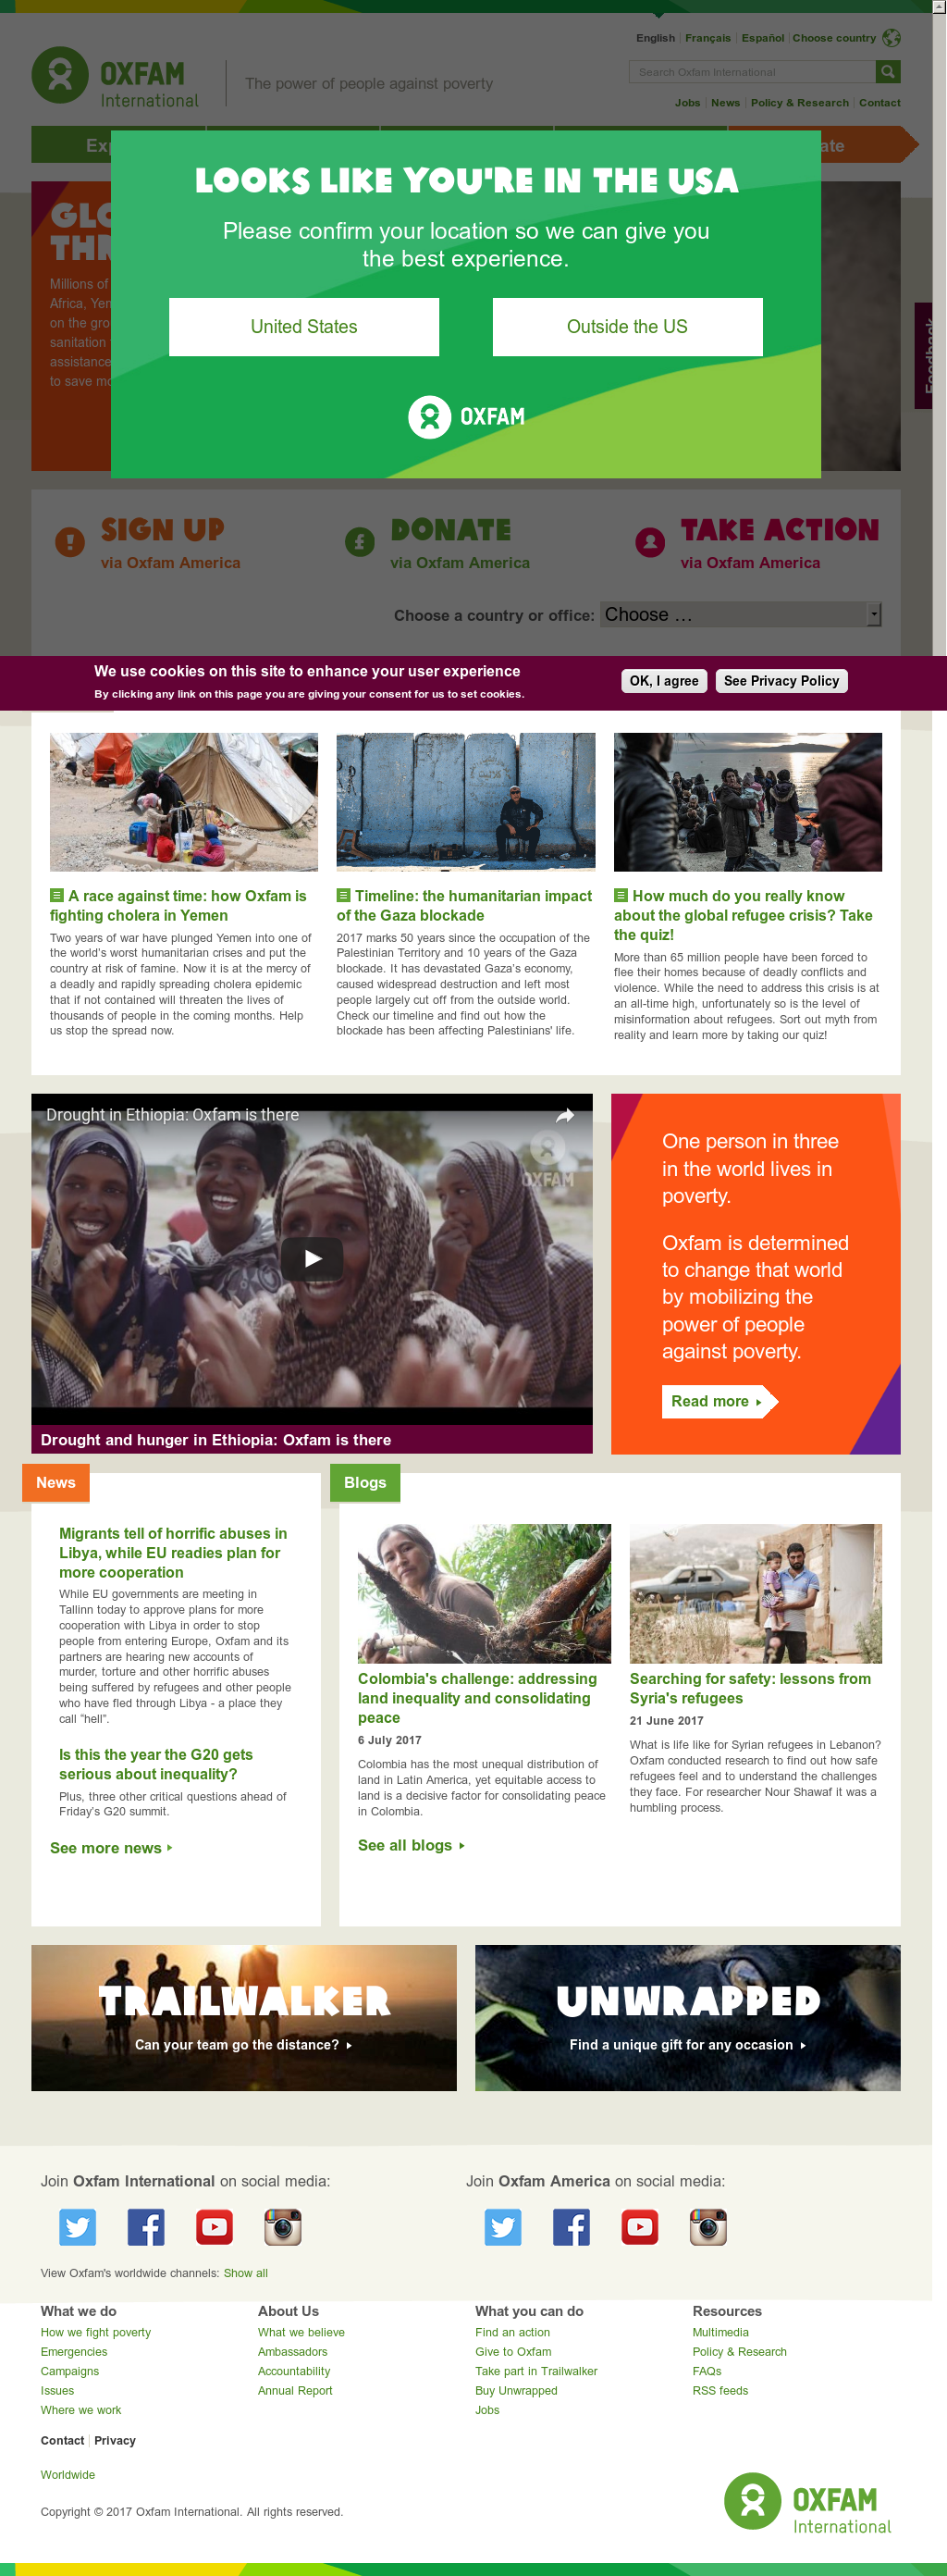 oxfam international history